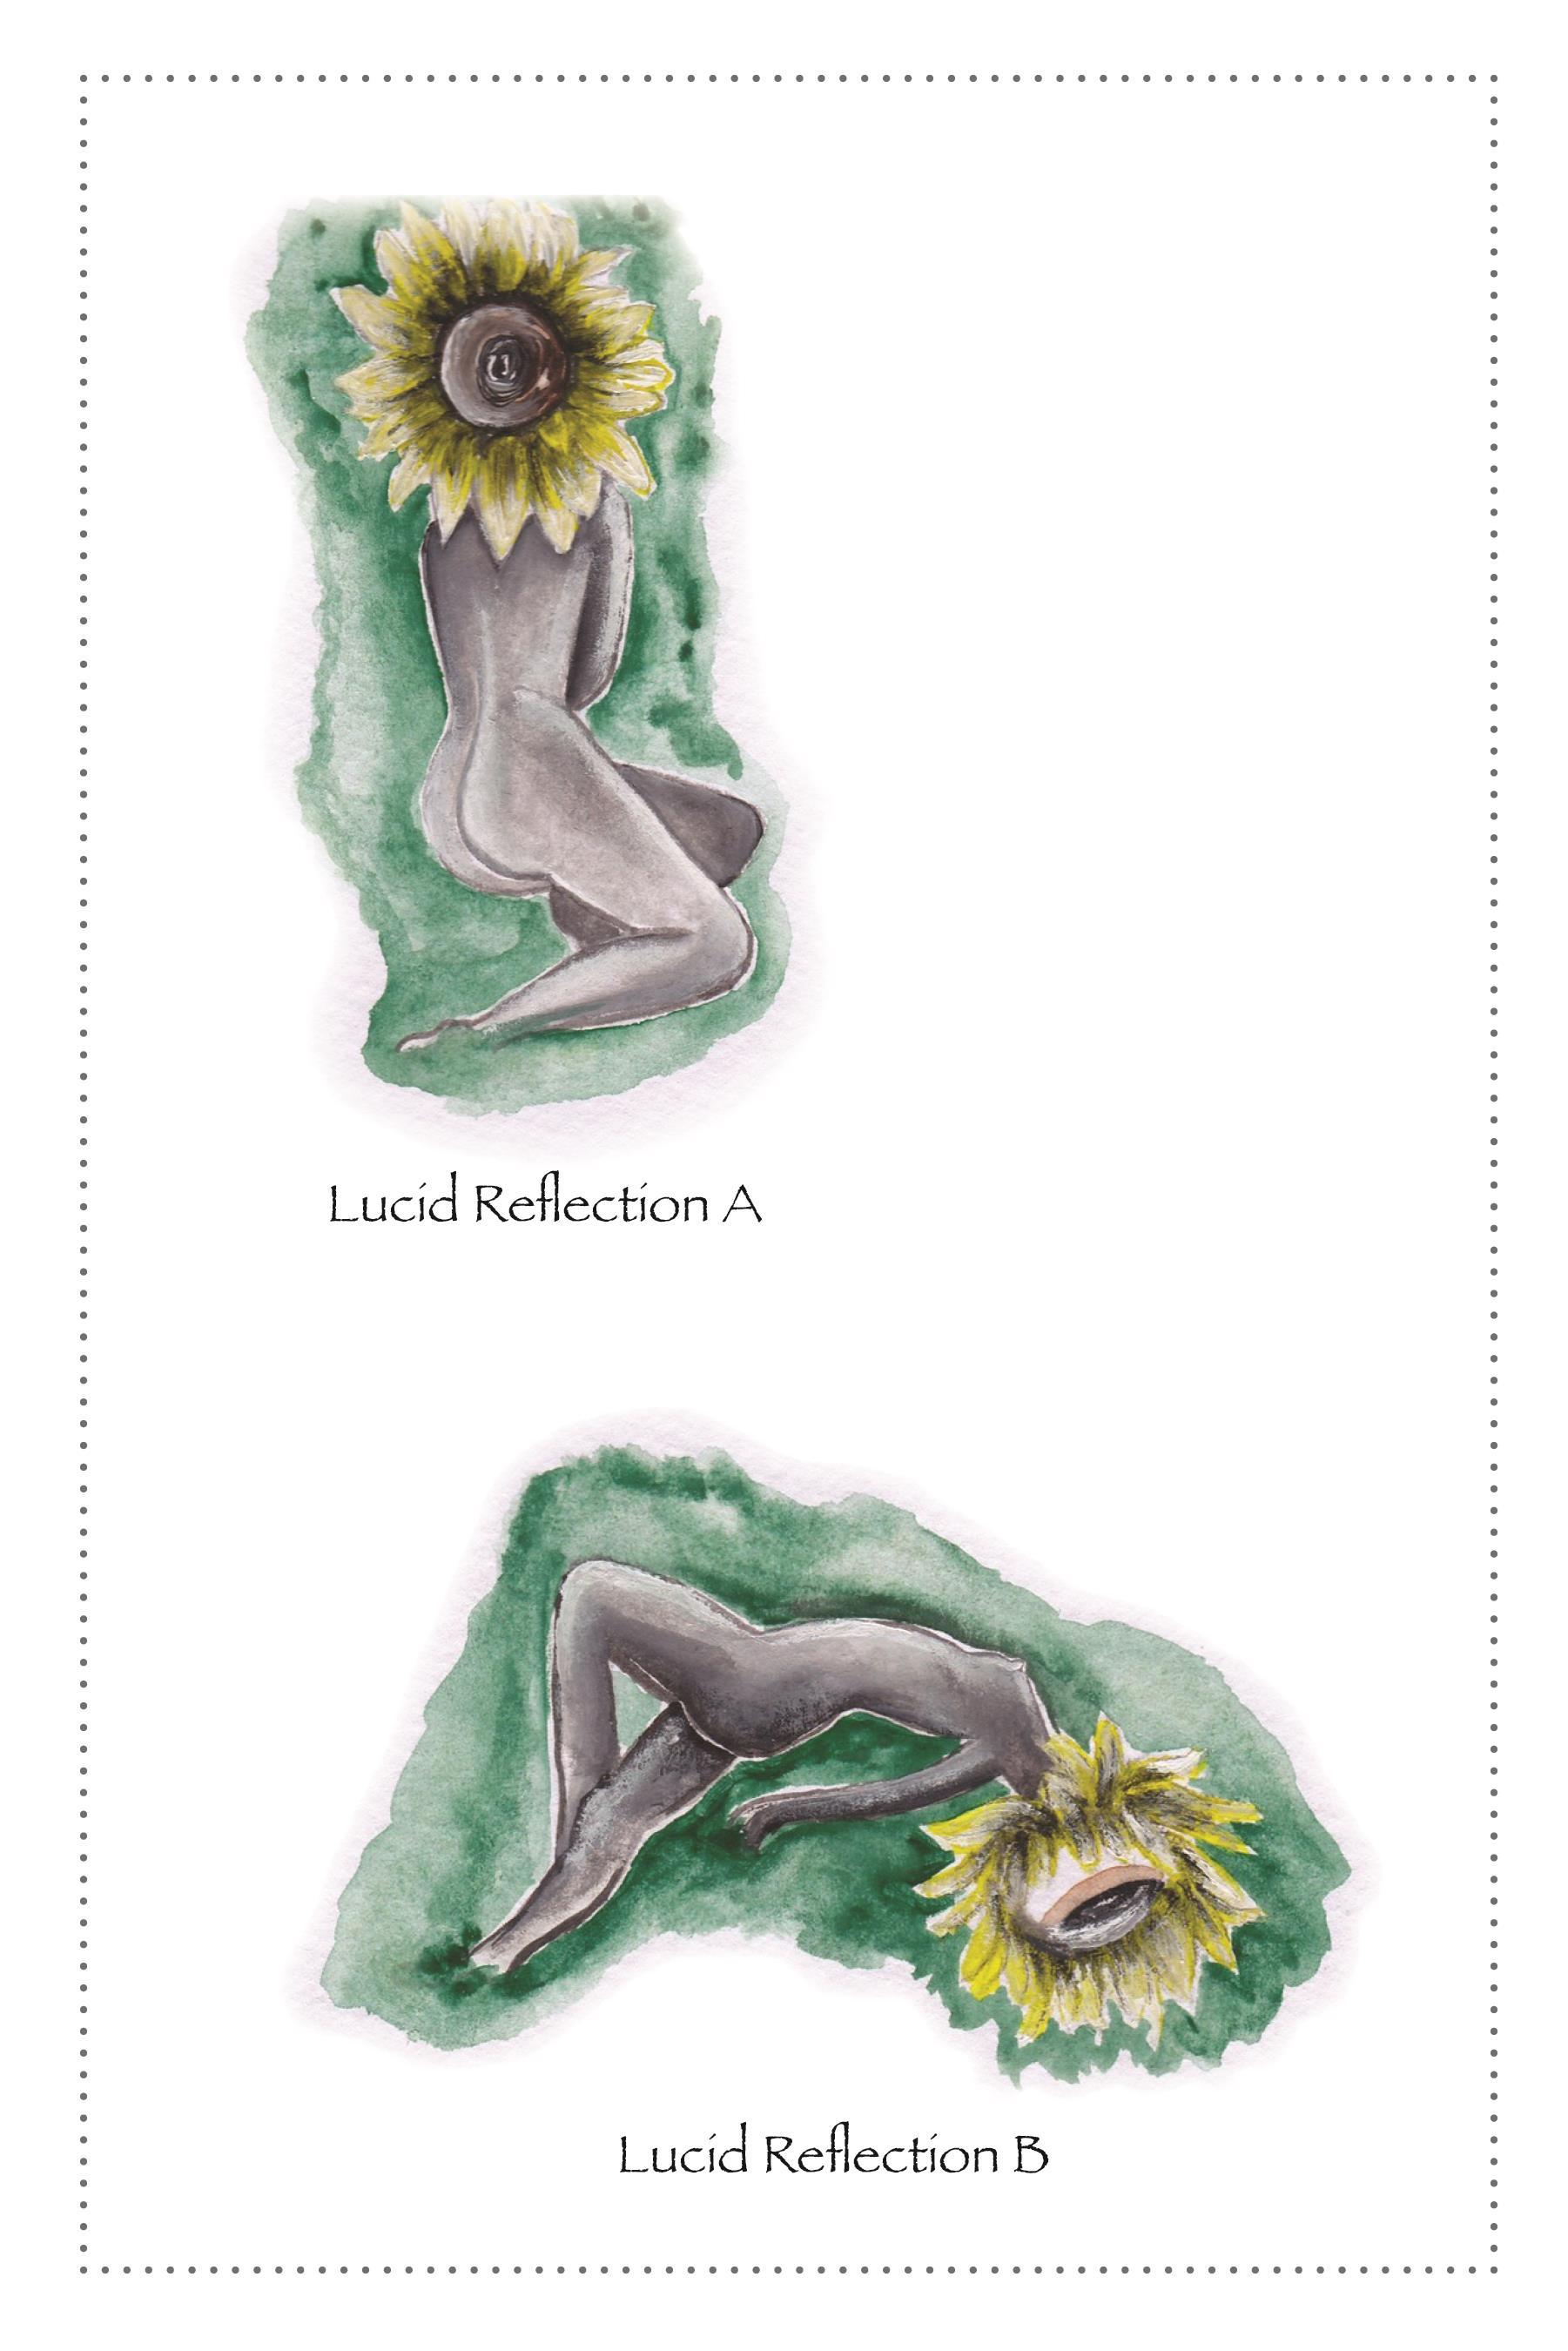 LUCID REFLECTION A & B300.jpg